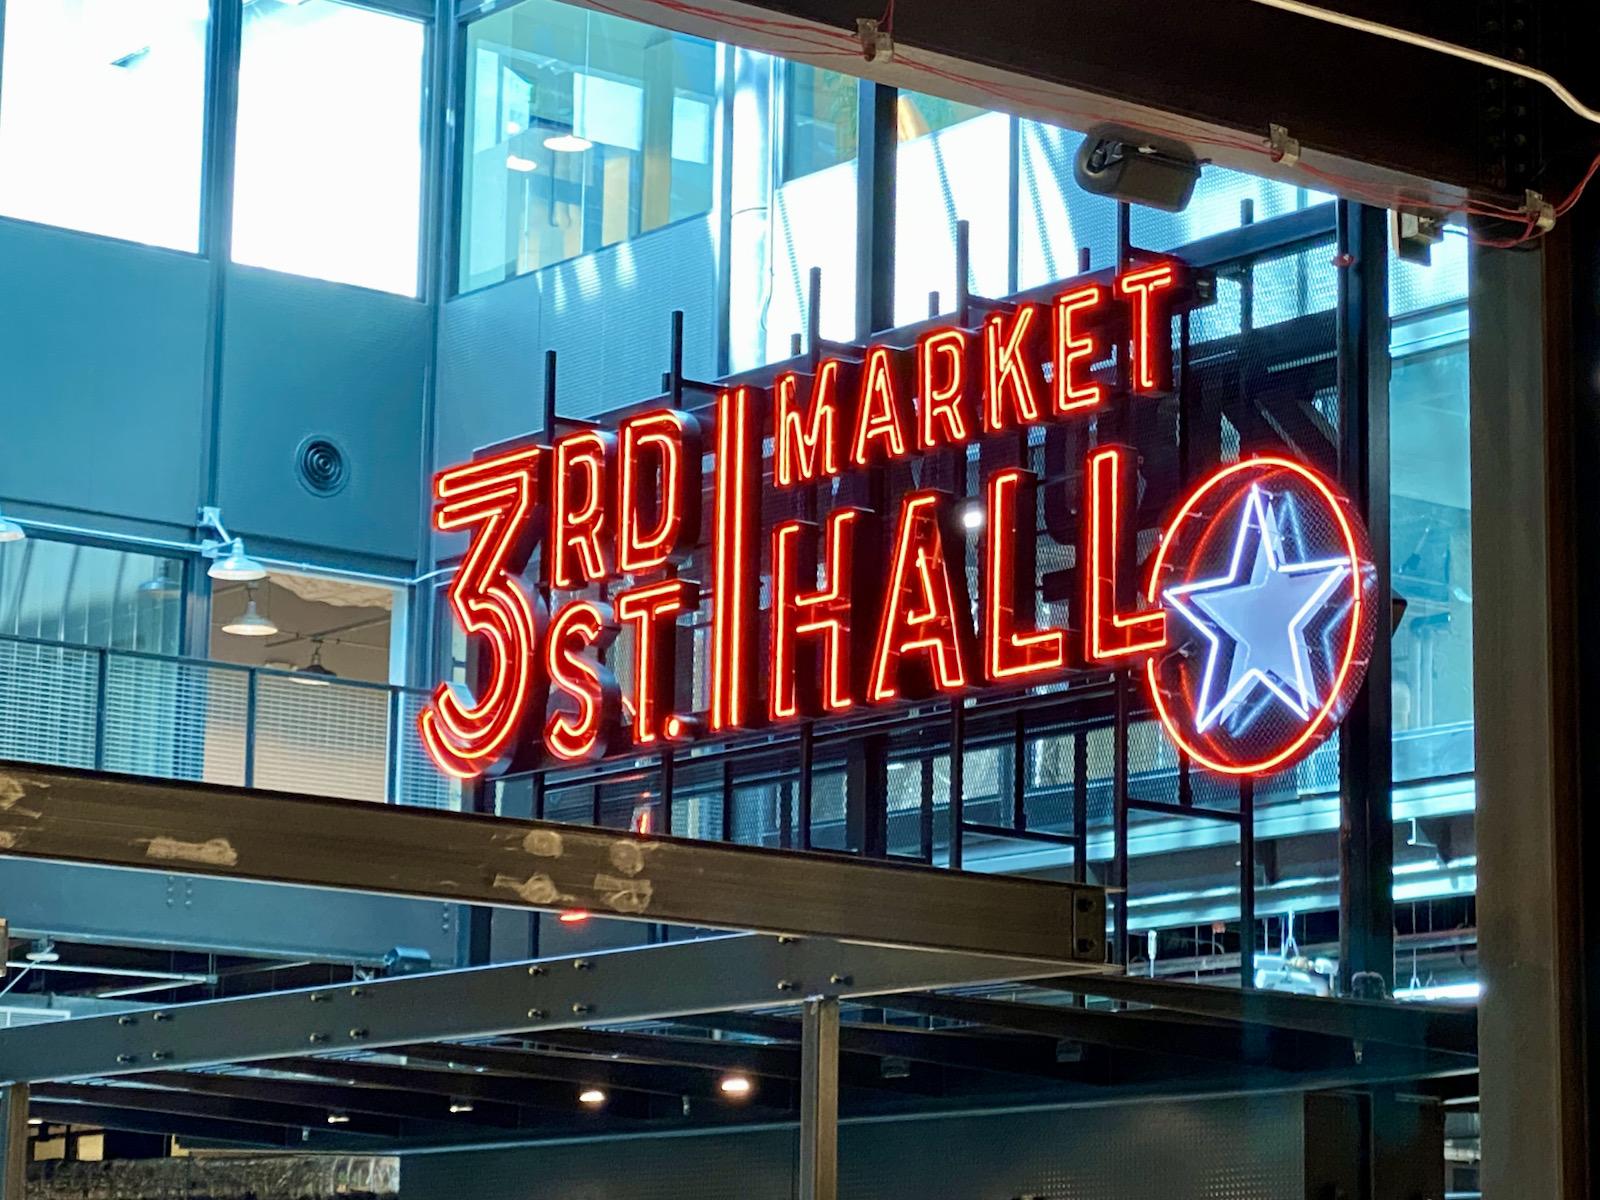 3rd Street Market Hall sign